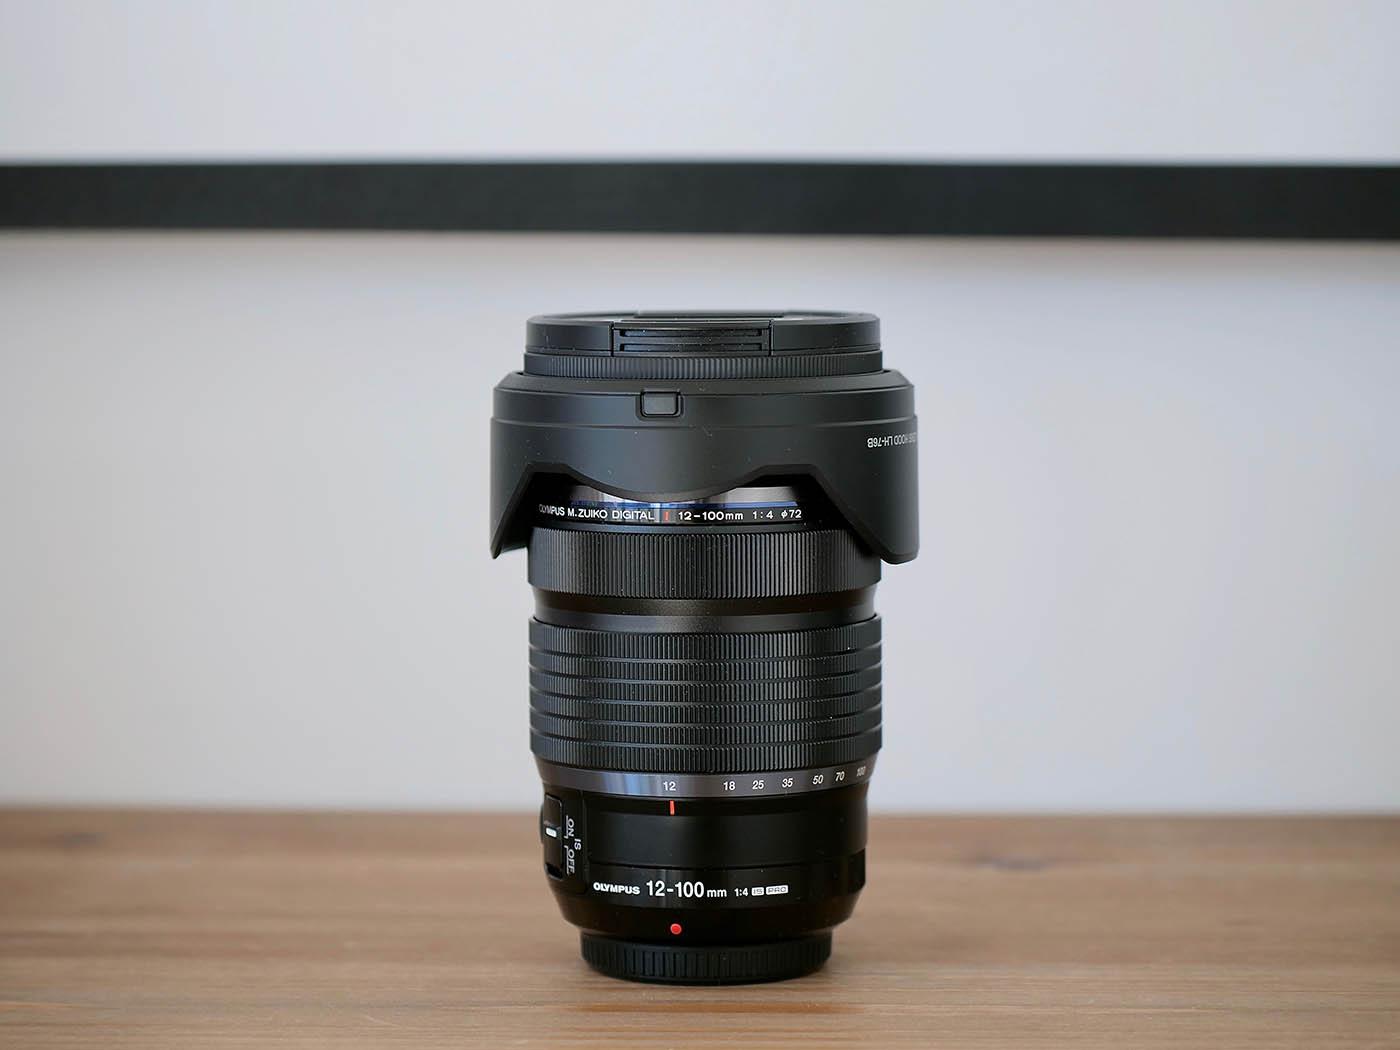 Olympus Zuiko 12-100 mm F4.0 IS Pro